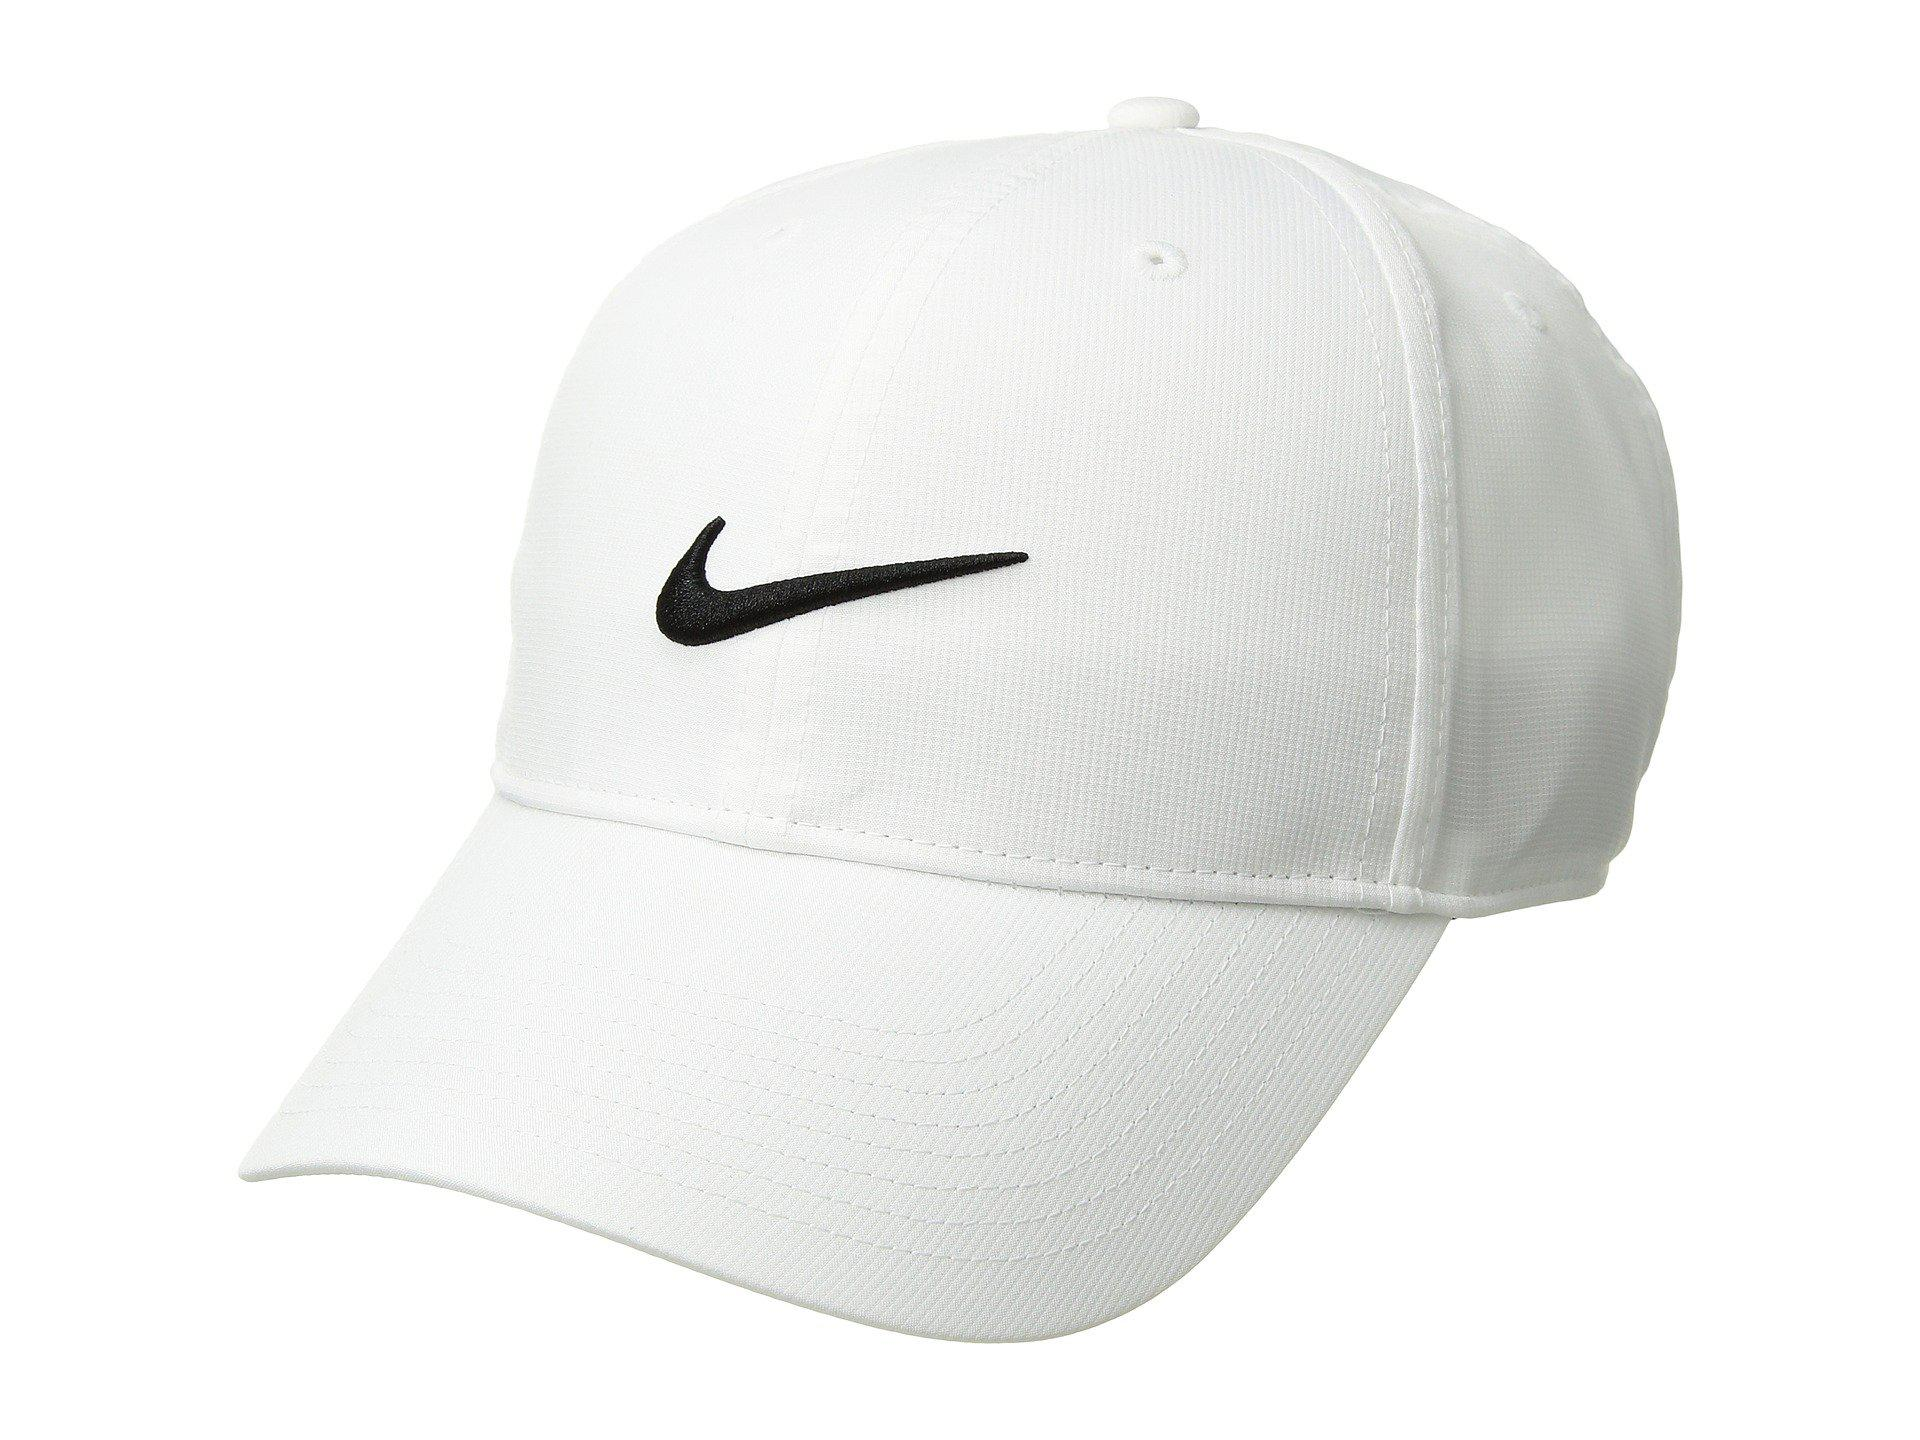 f29e34fb7eca7 Lyst - Nike Cap L91 Tech (black anthracite white) Caps in White for Men